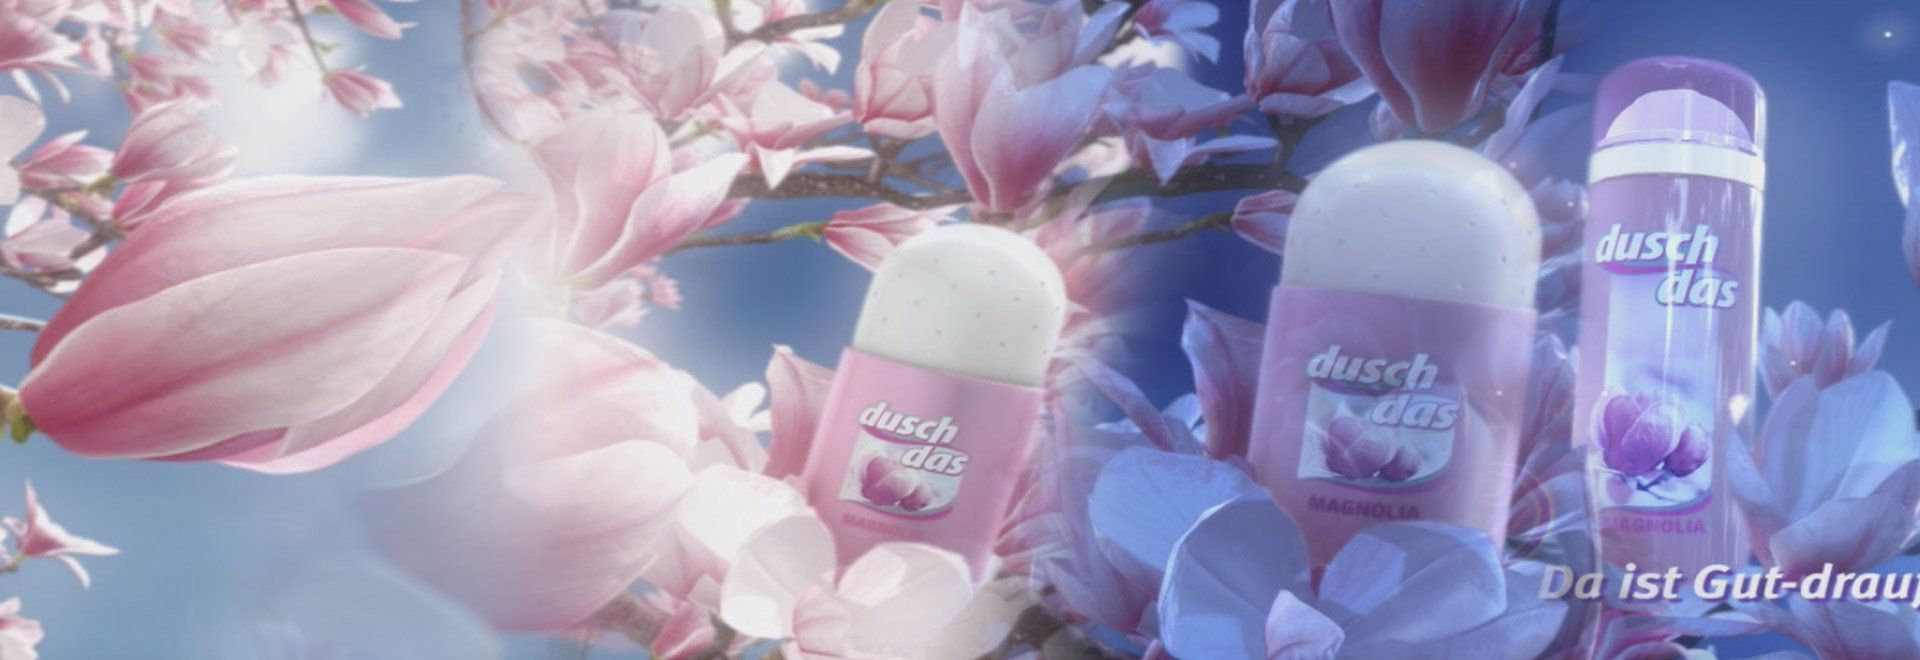 js-filmproduction-postproduction-commercial-duschdas-magnolia-header